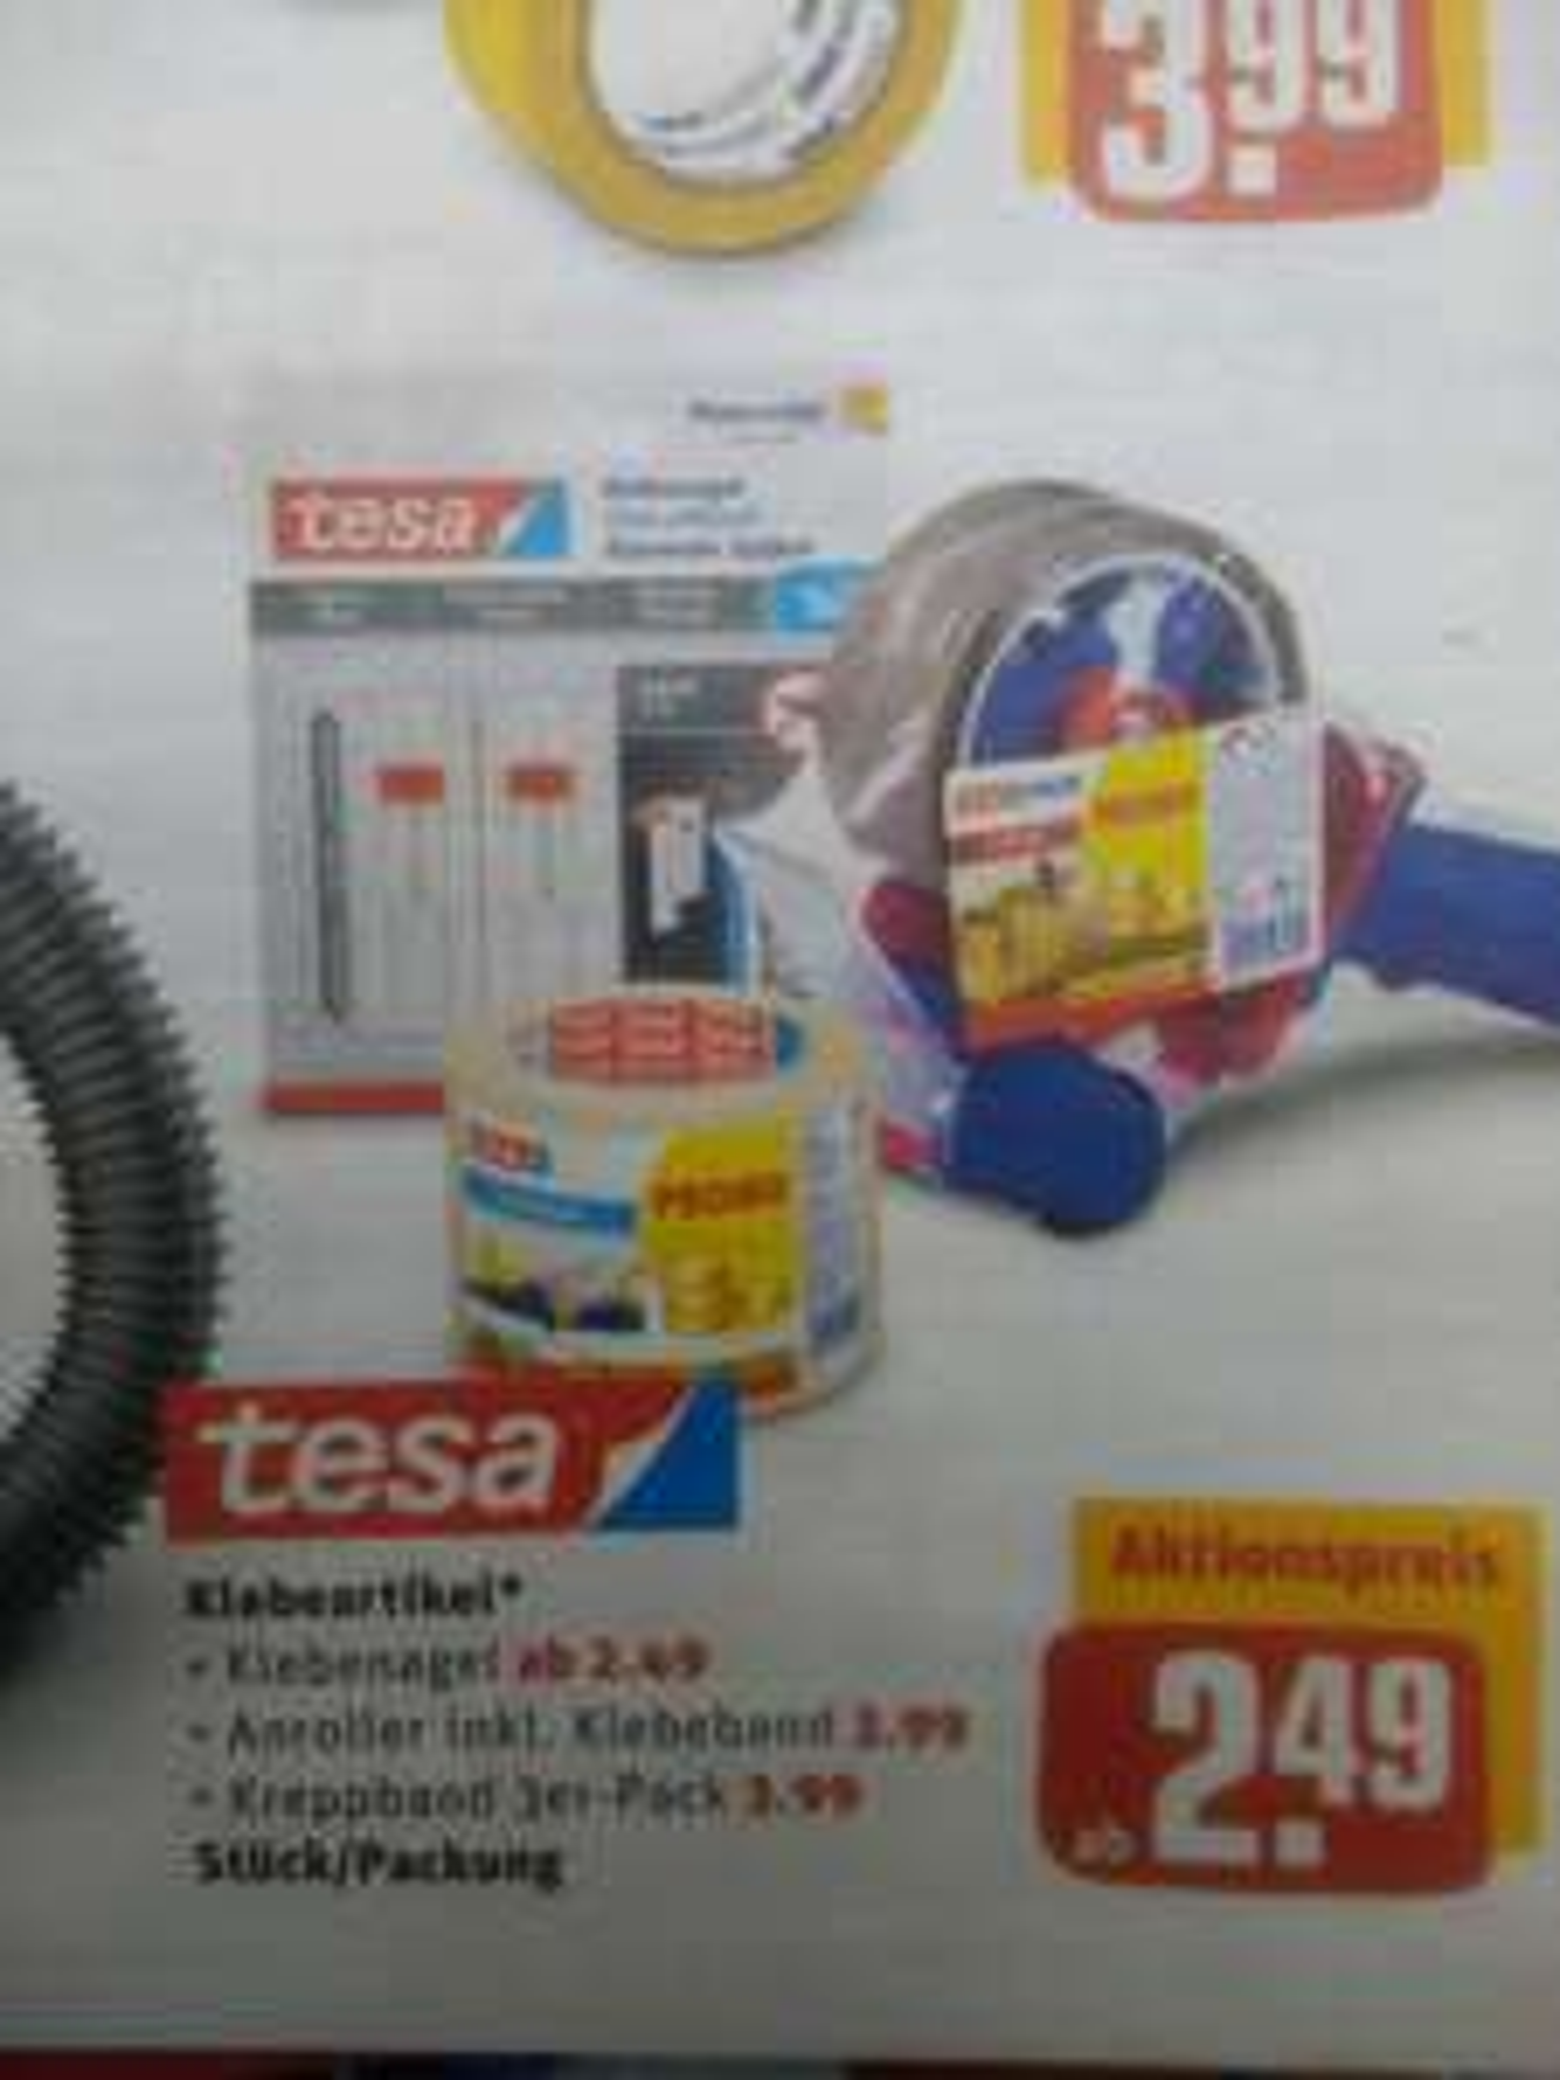 REWE Center: Tesa Abroller incl. Klebeband